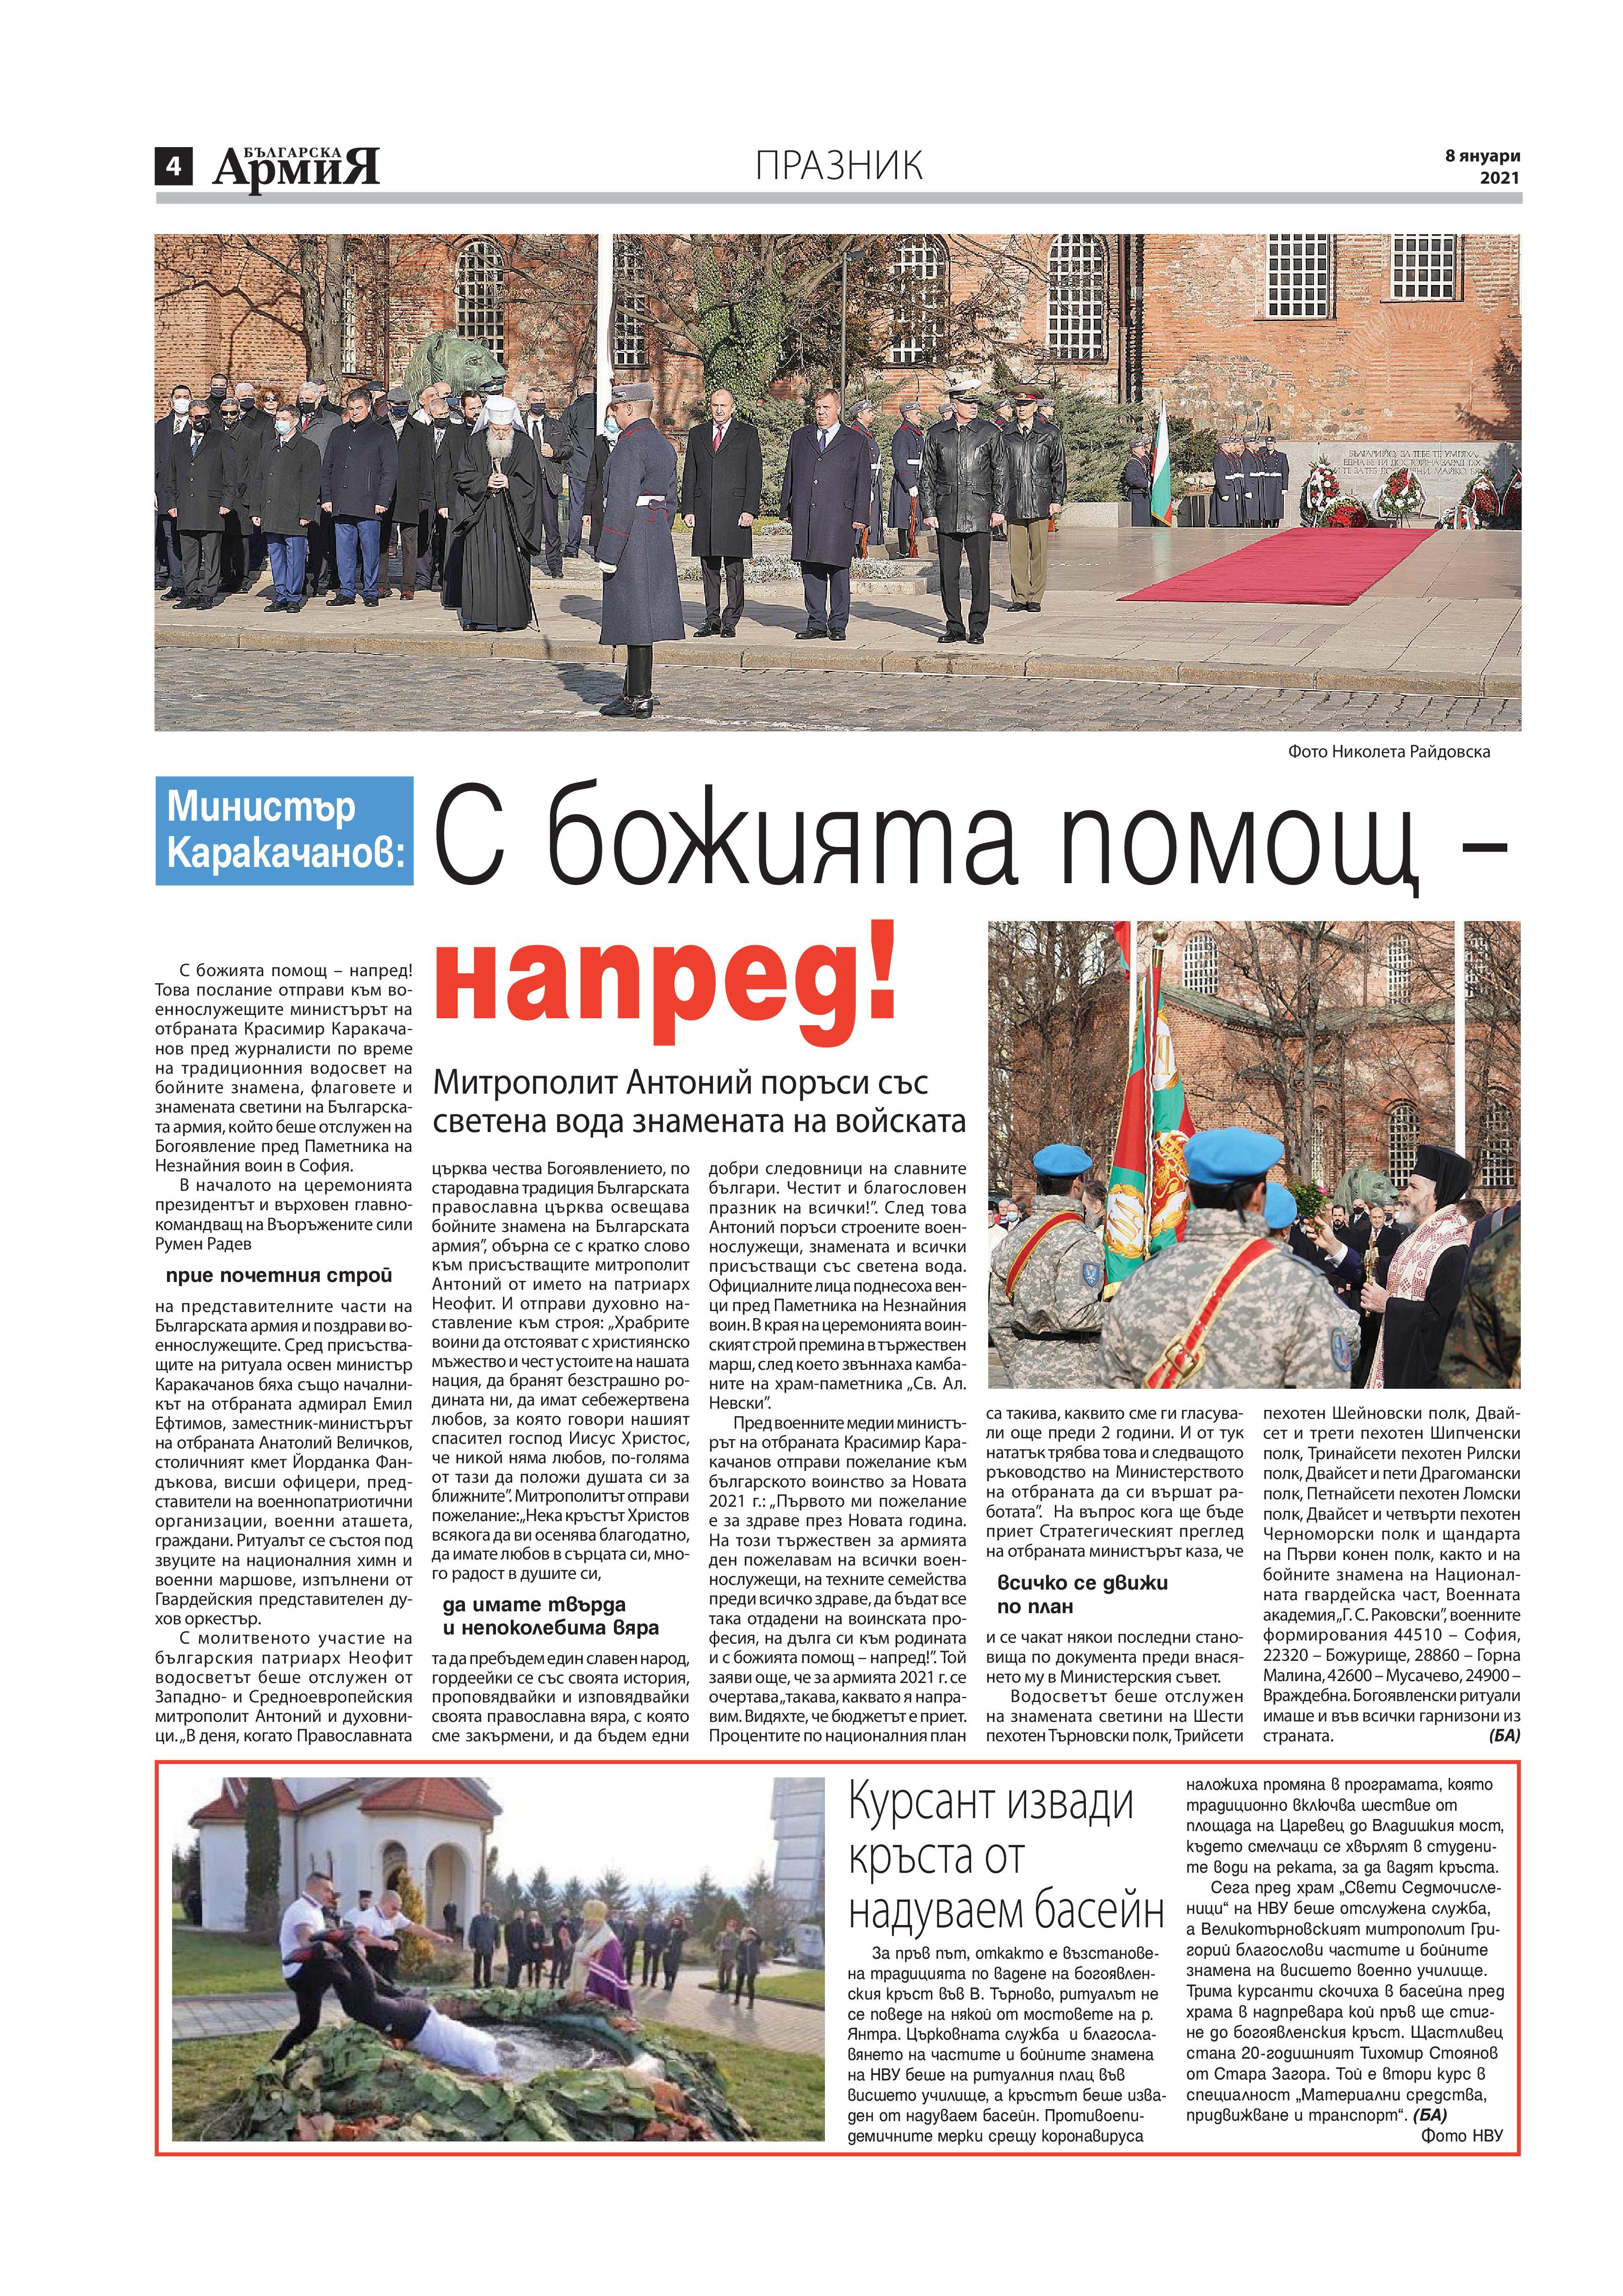 https://www.armymedia.bg/wp-content/uploads/2015/06/04-54.jpg